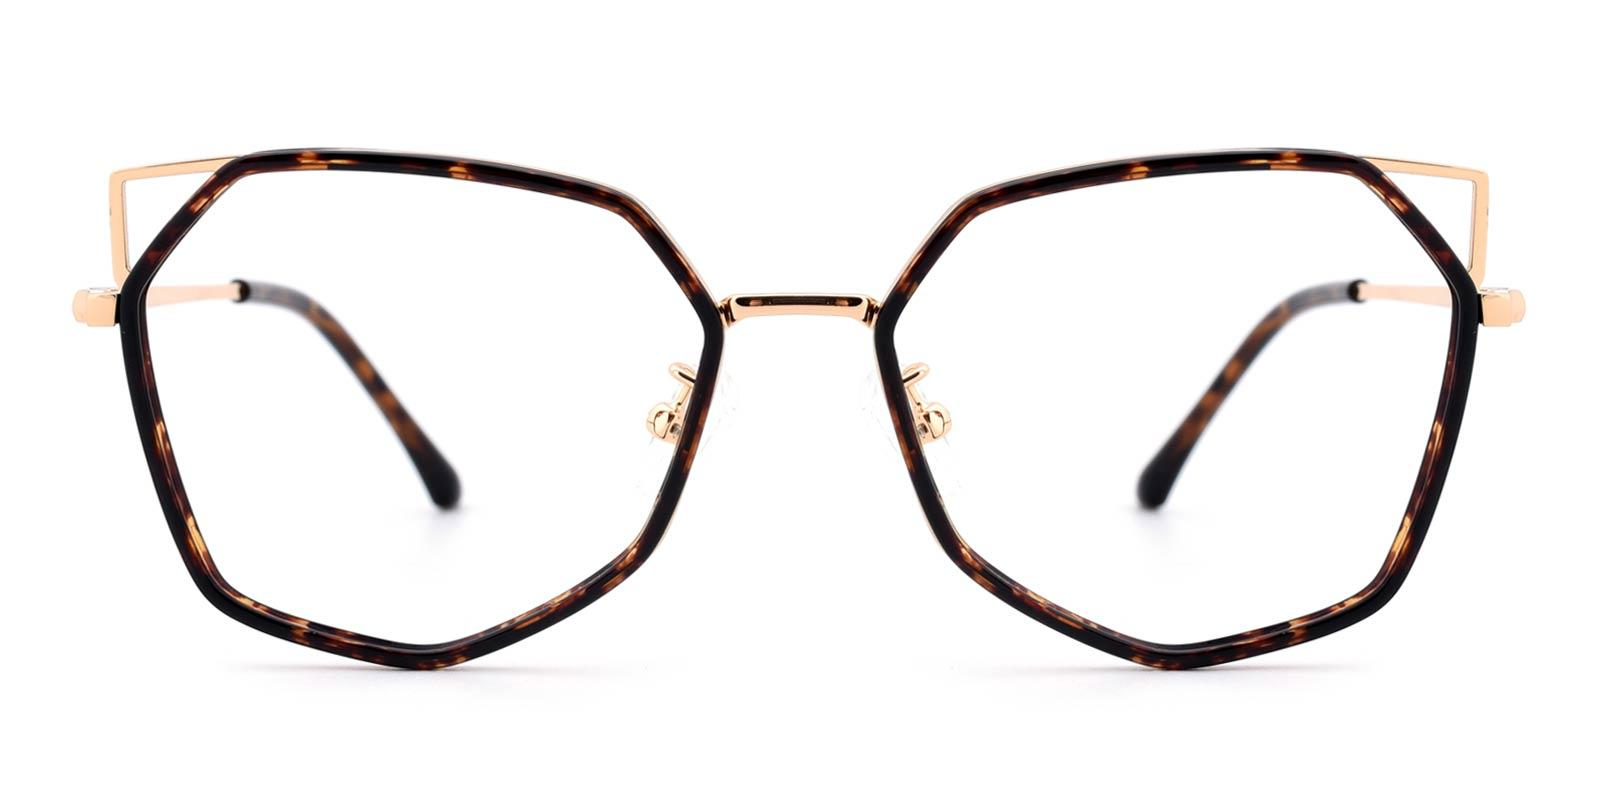 Laurel-Tortoise-Geometric-TR-Eyeglasses-detail